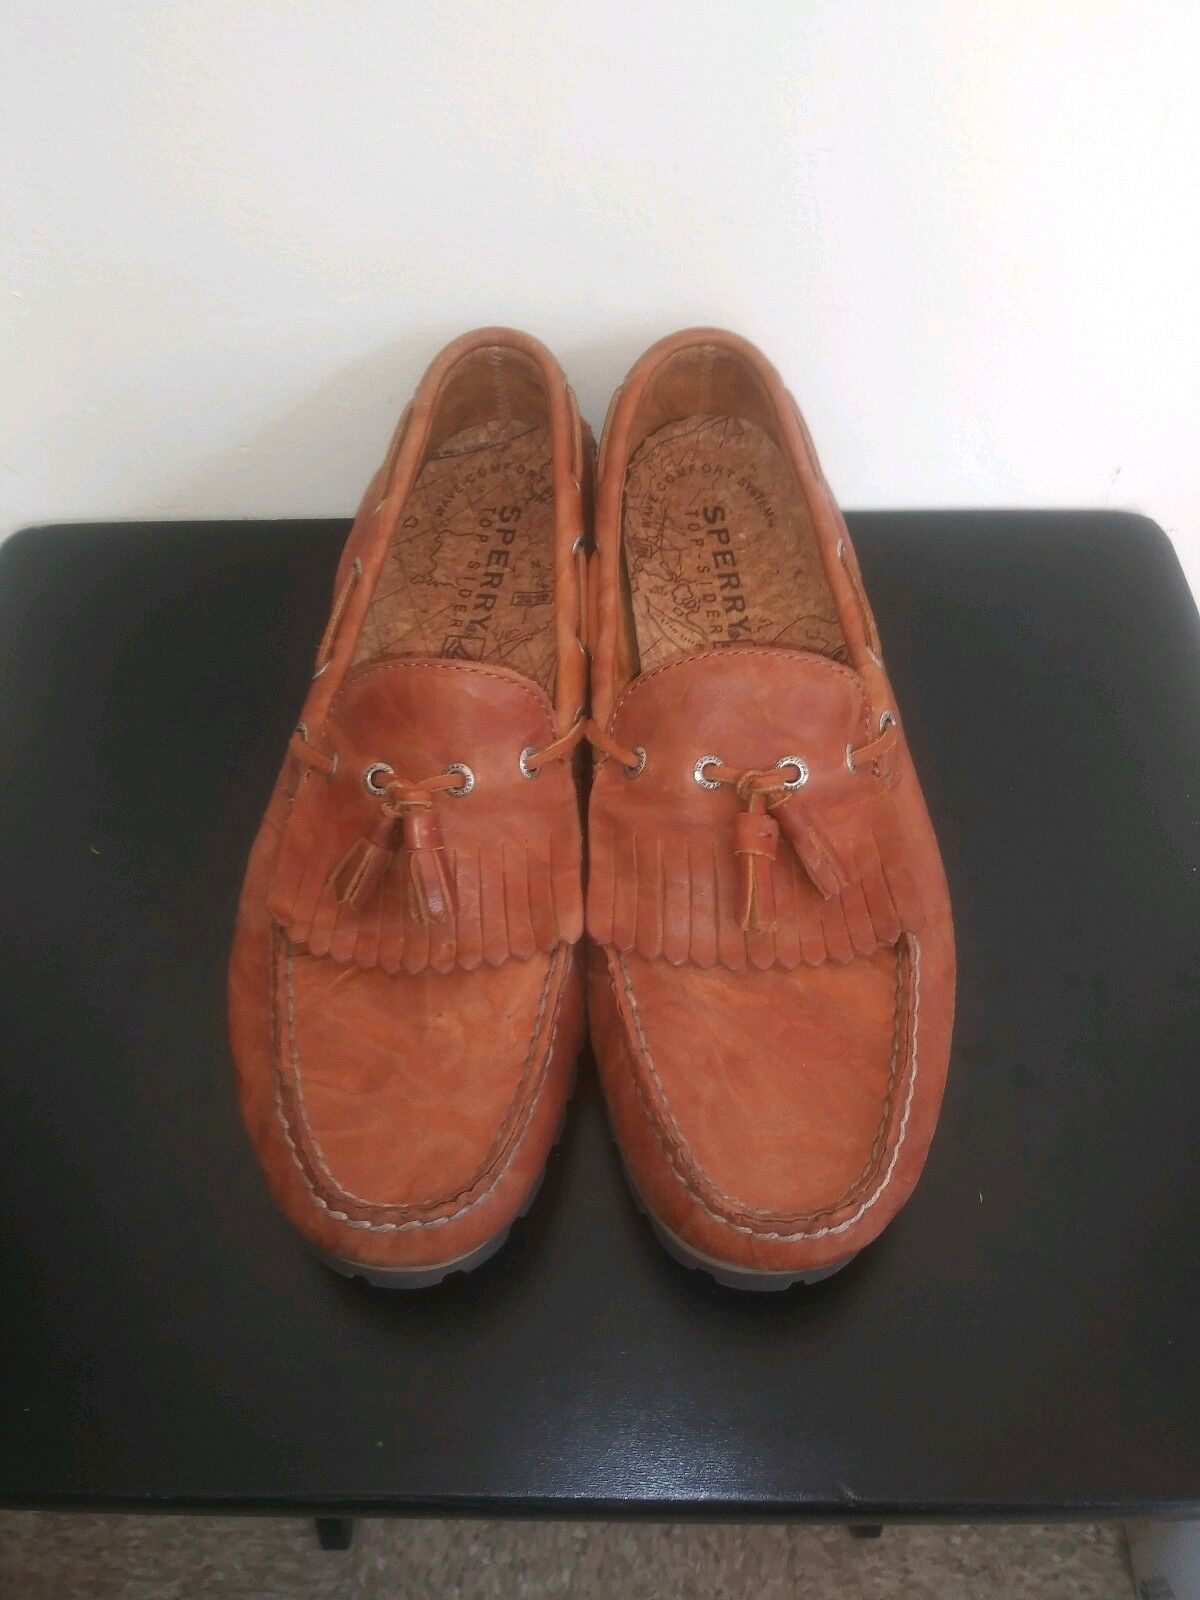 Sperry Top Sider Mens 13  Leather Slip On Tassel Loafer Boat shoes 0735308